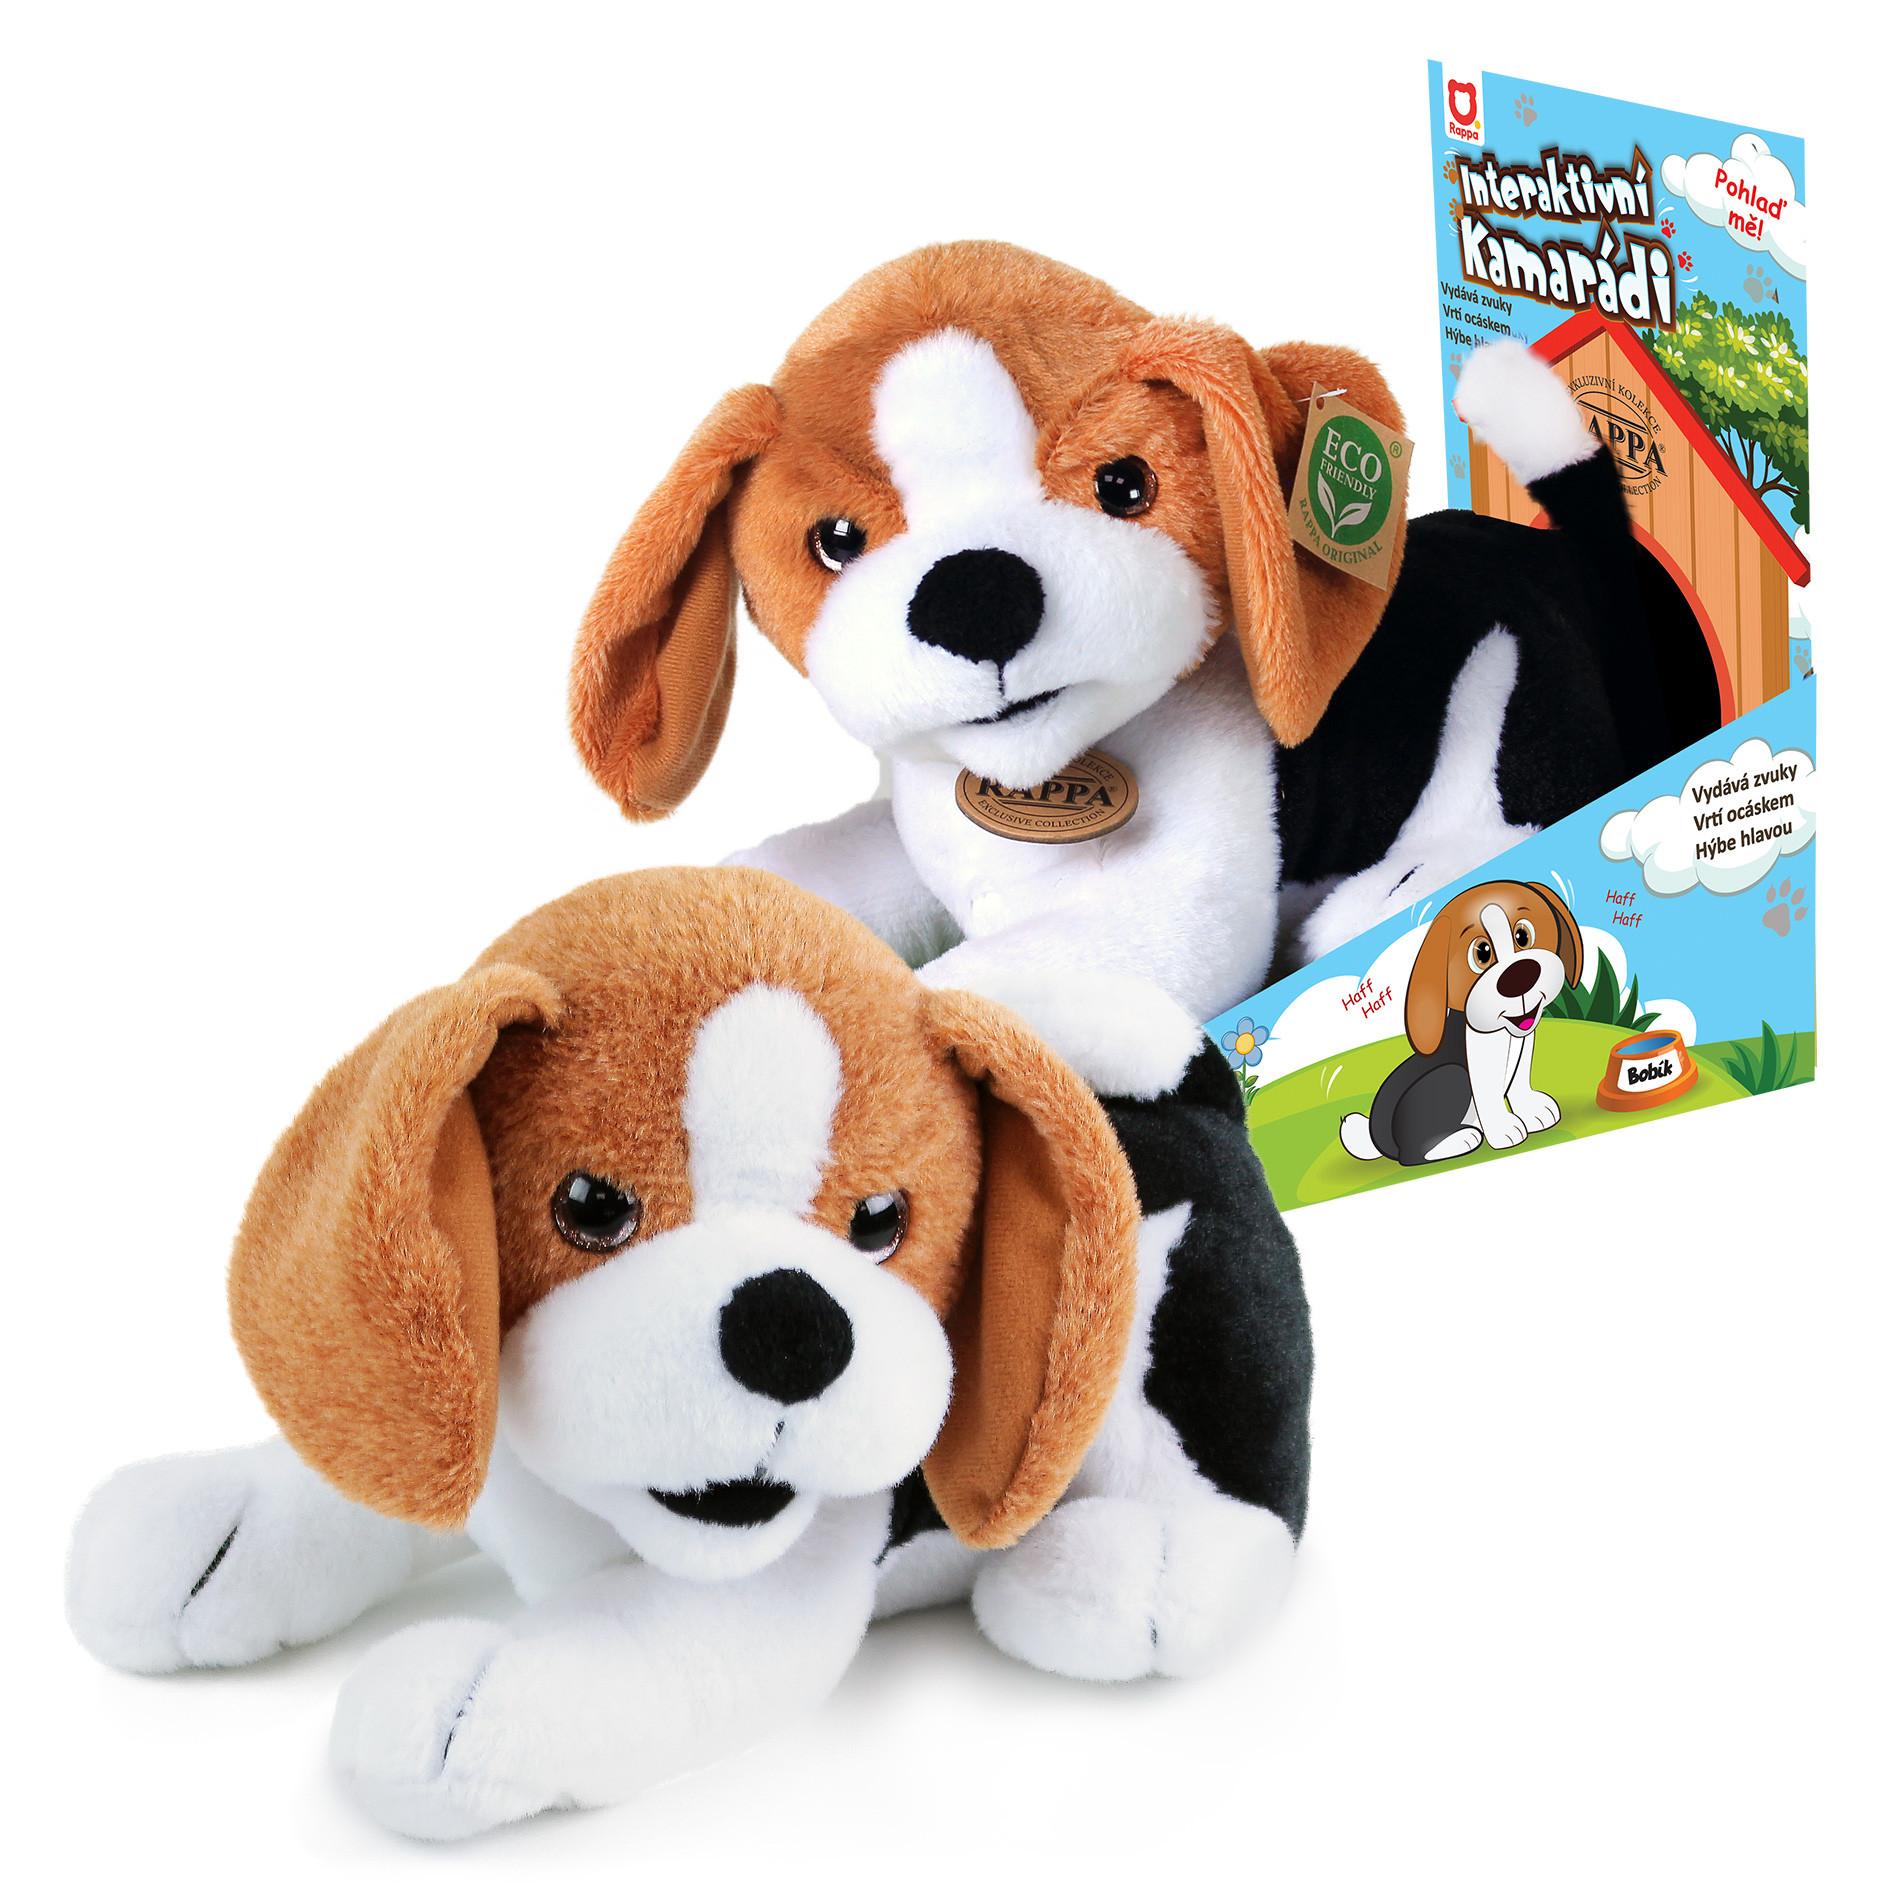 the plush buddy dog Bobík interactive